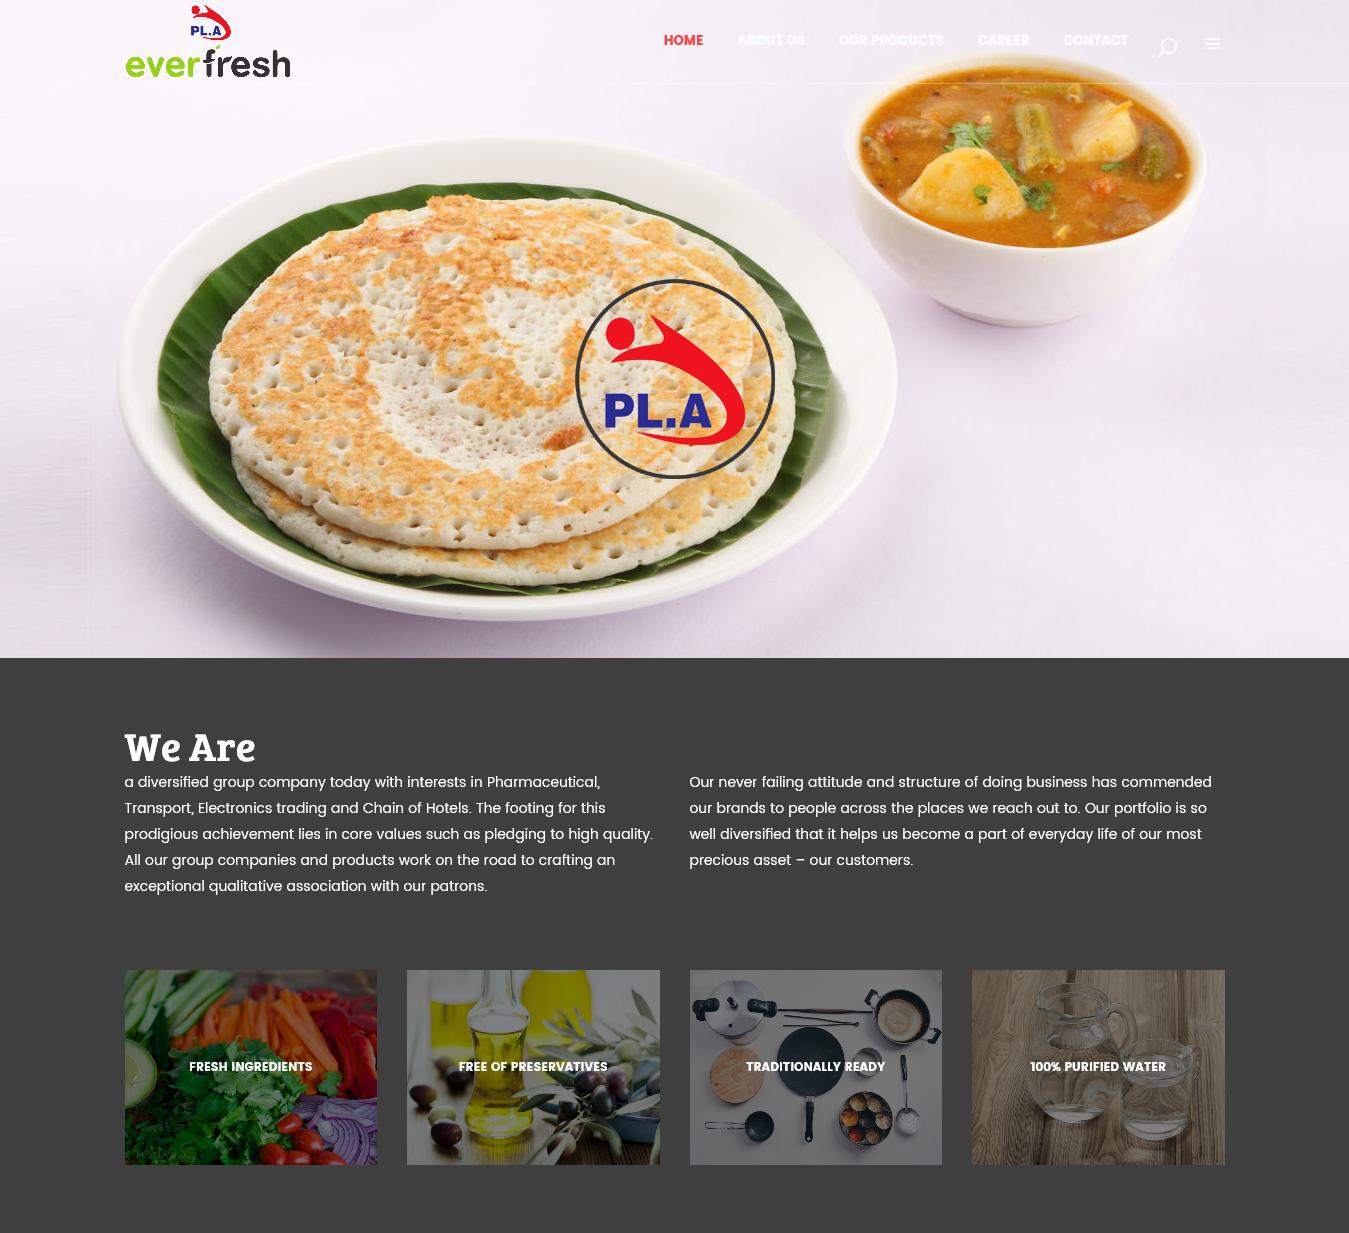 plaeverfresh.com